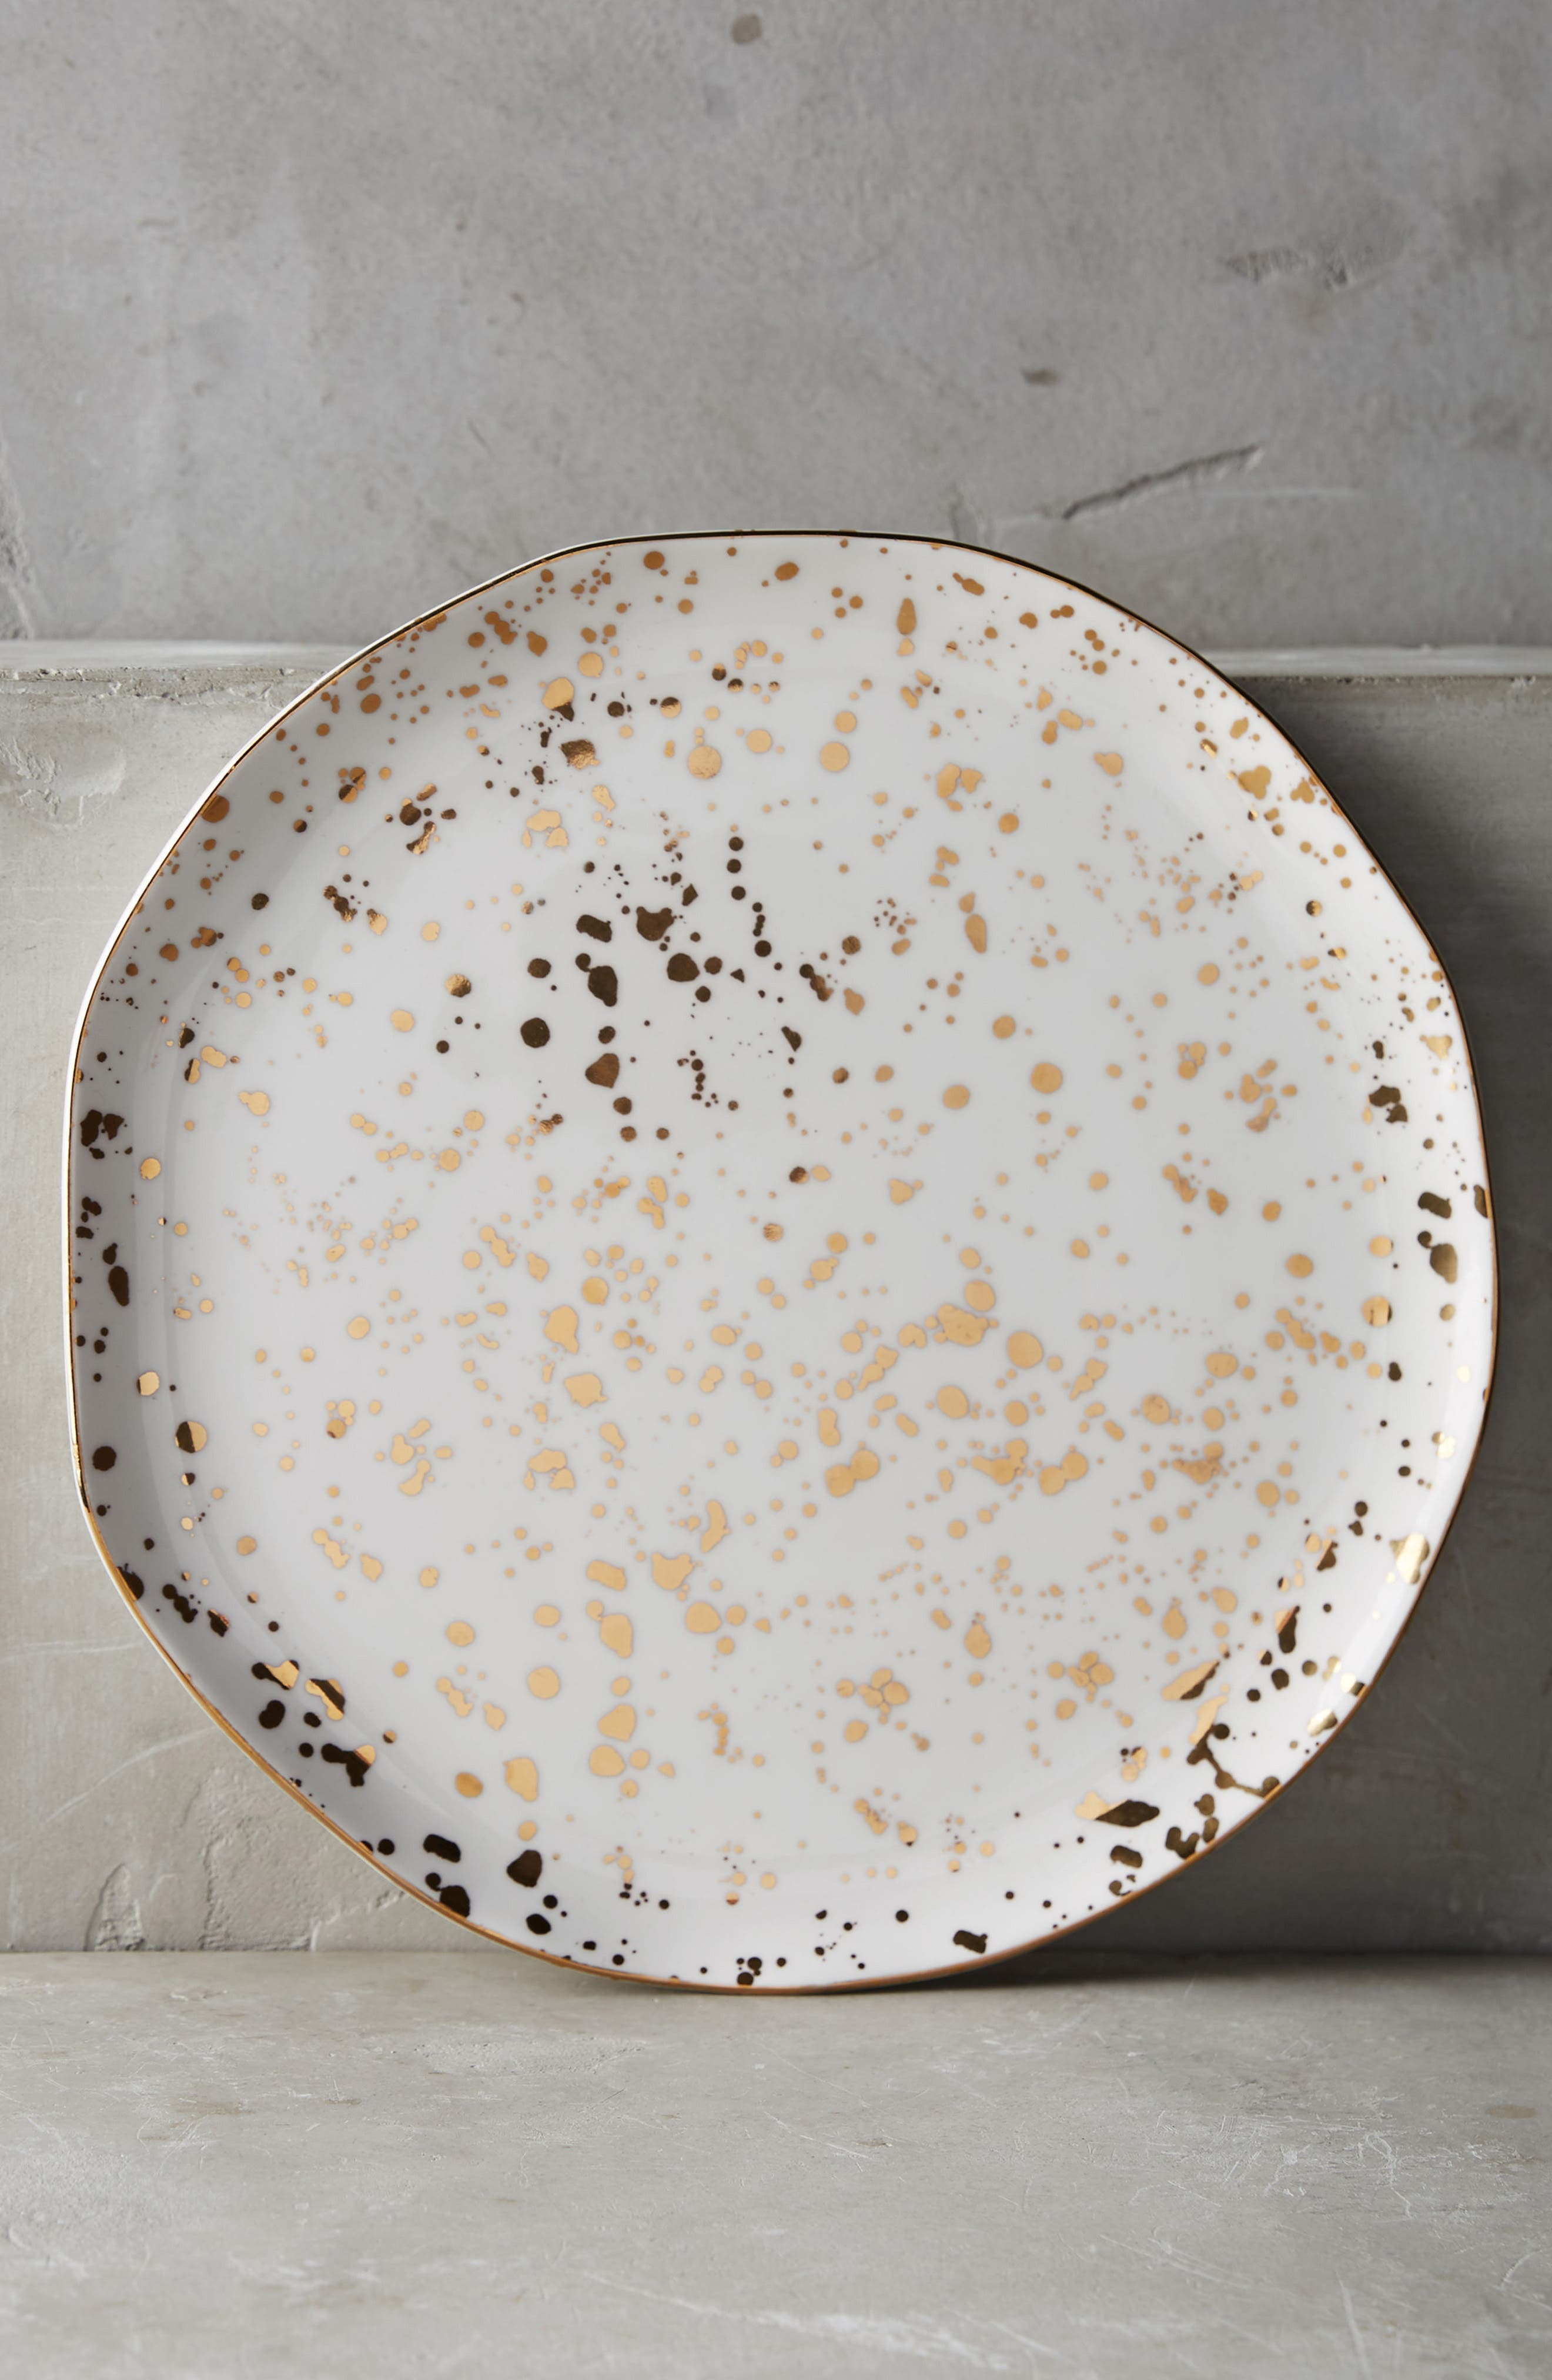 Anthropologie Mimira Stoneware Dinner Plate